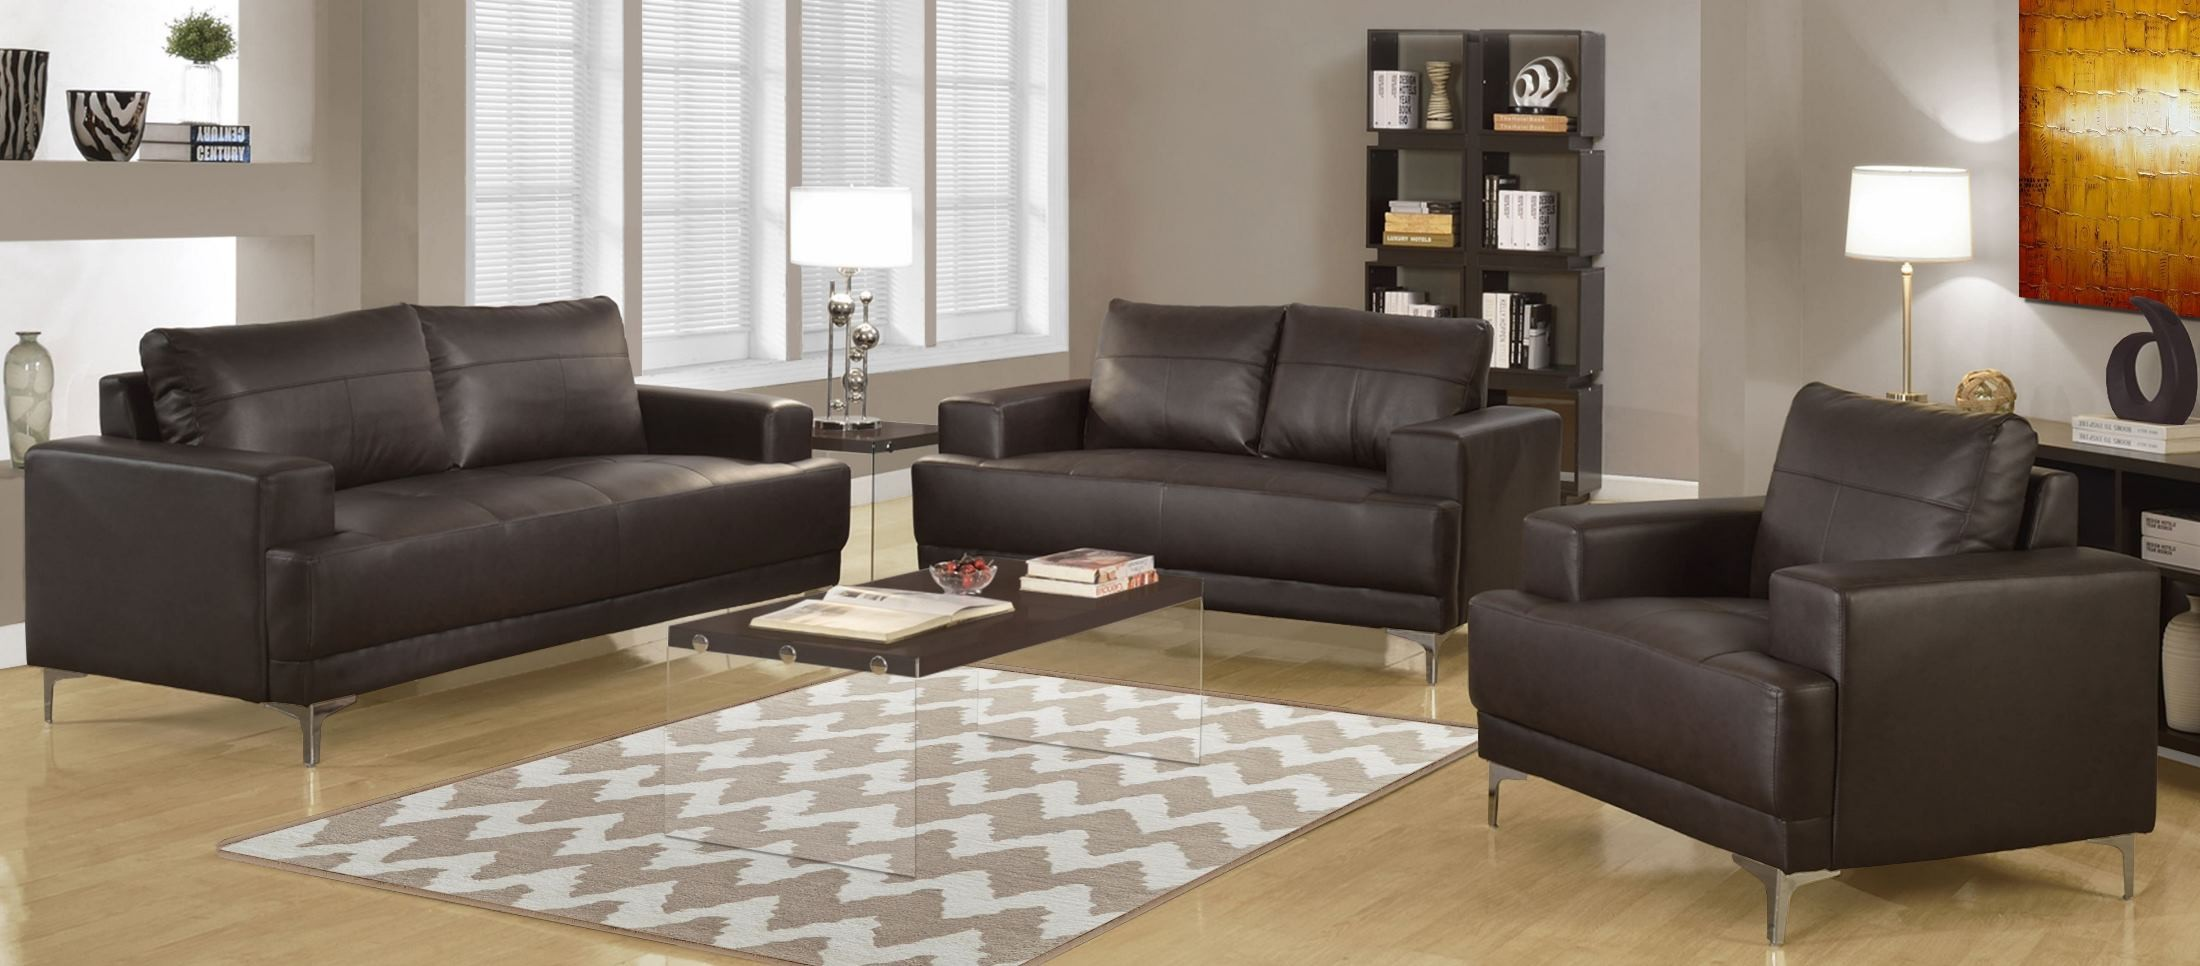 Brown Bonded Leather Living Room Set, 8603BR, Monarch